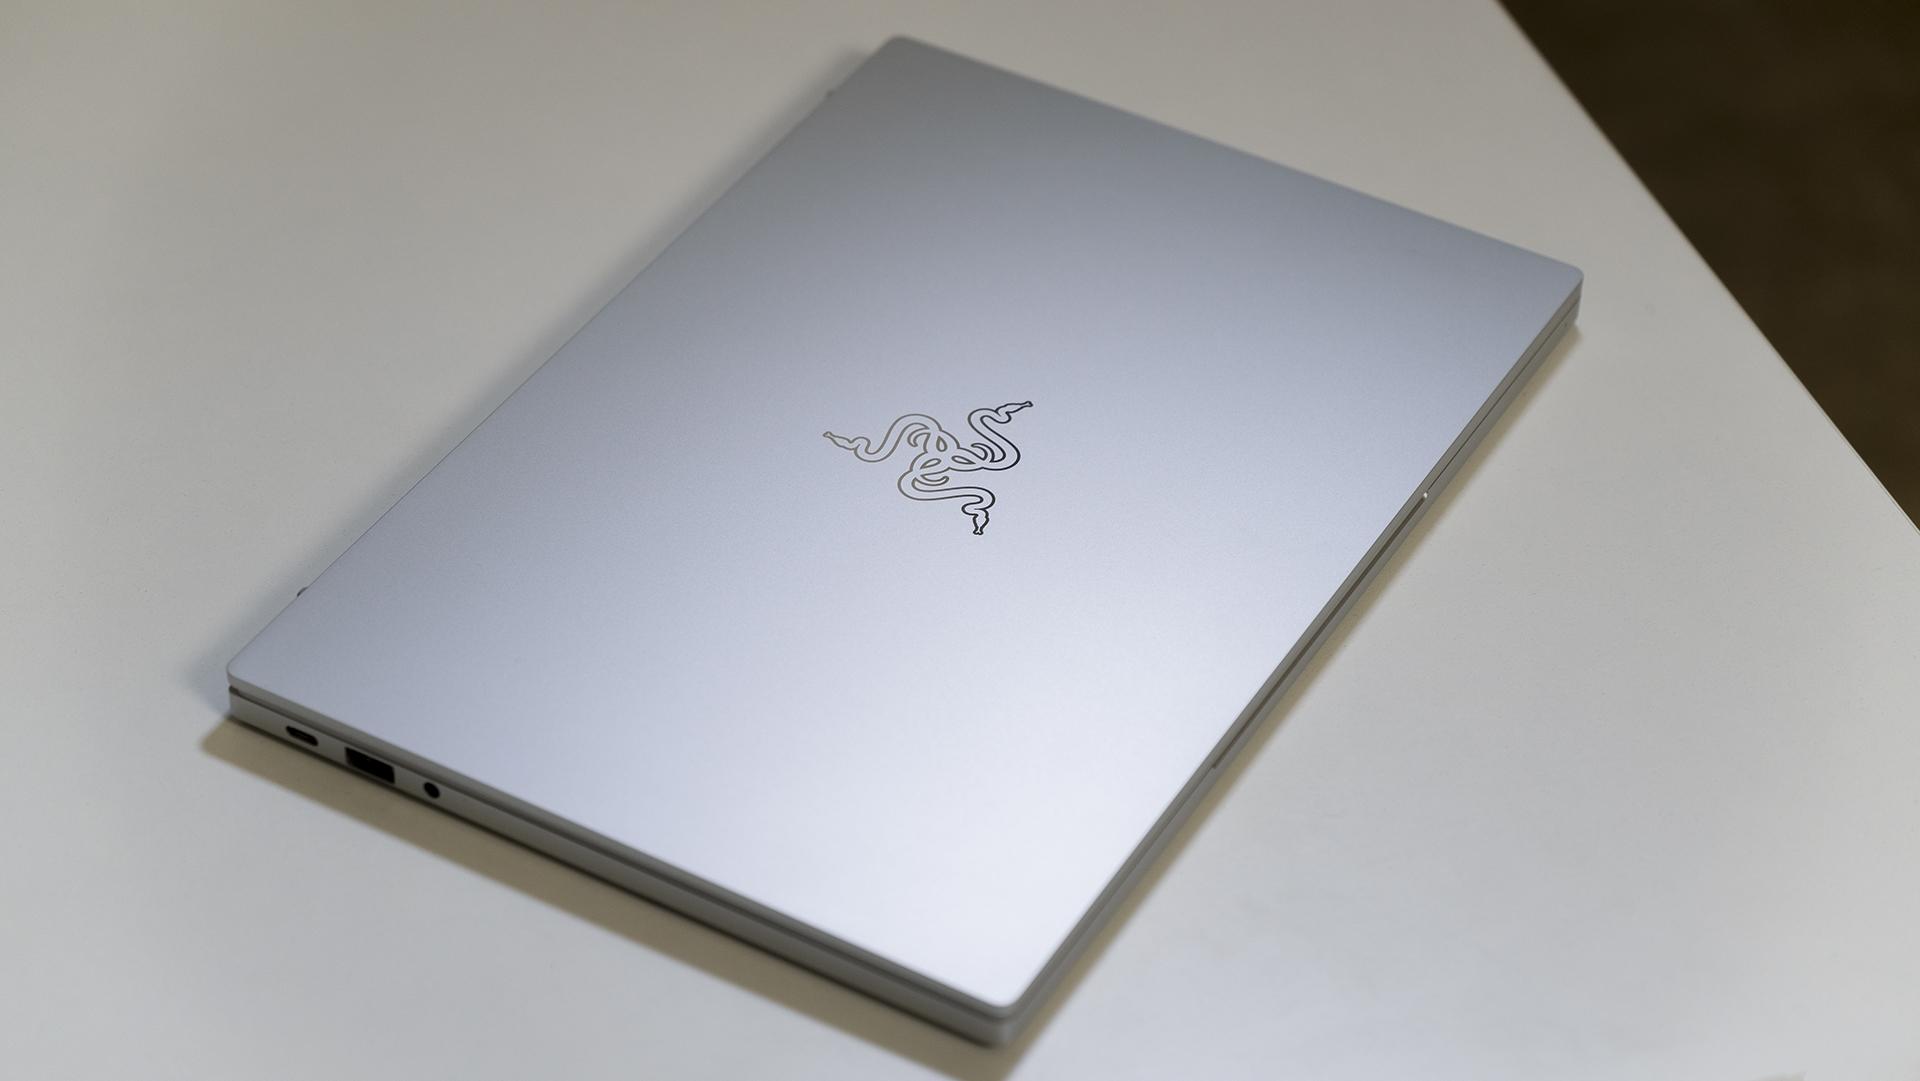 Razer Book 13 Deckel geschlossen links